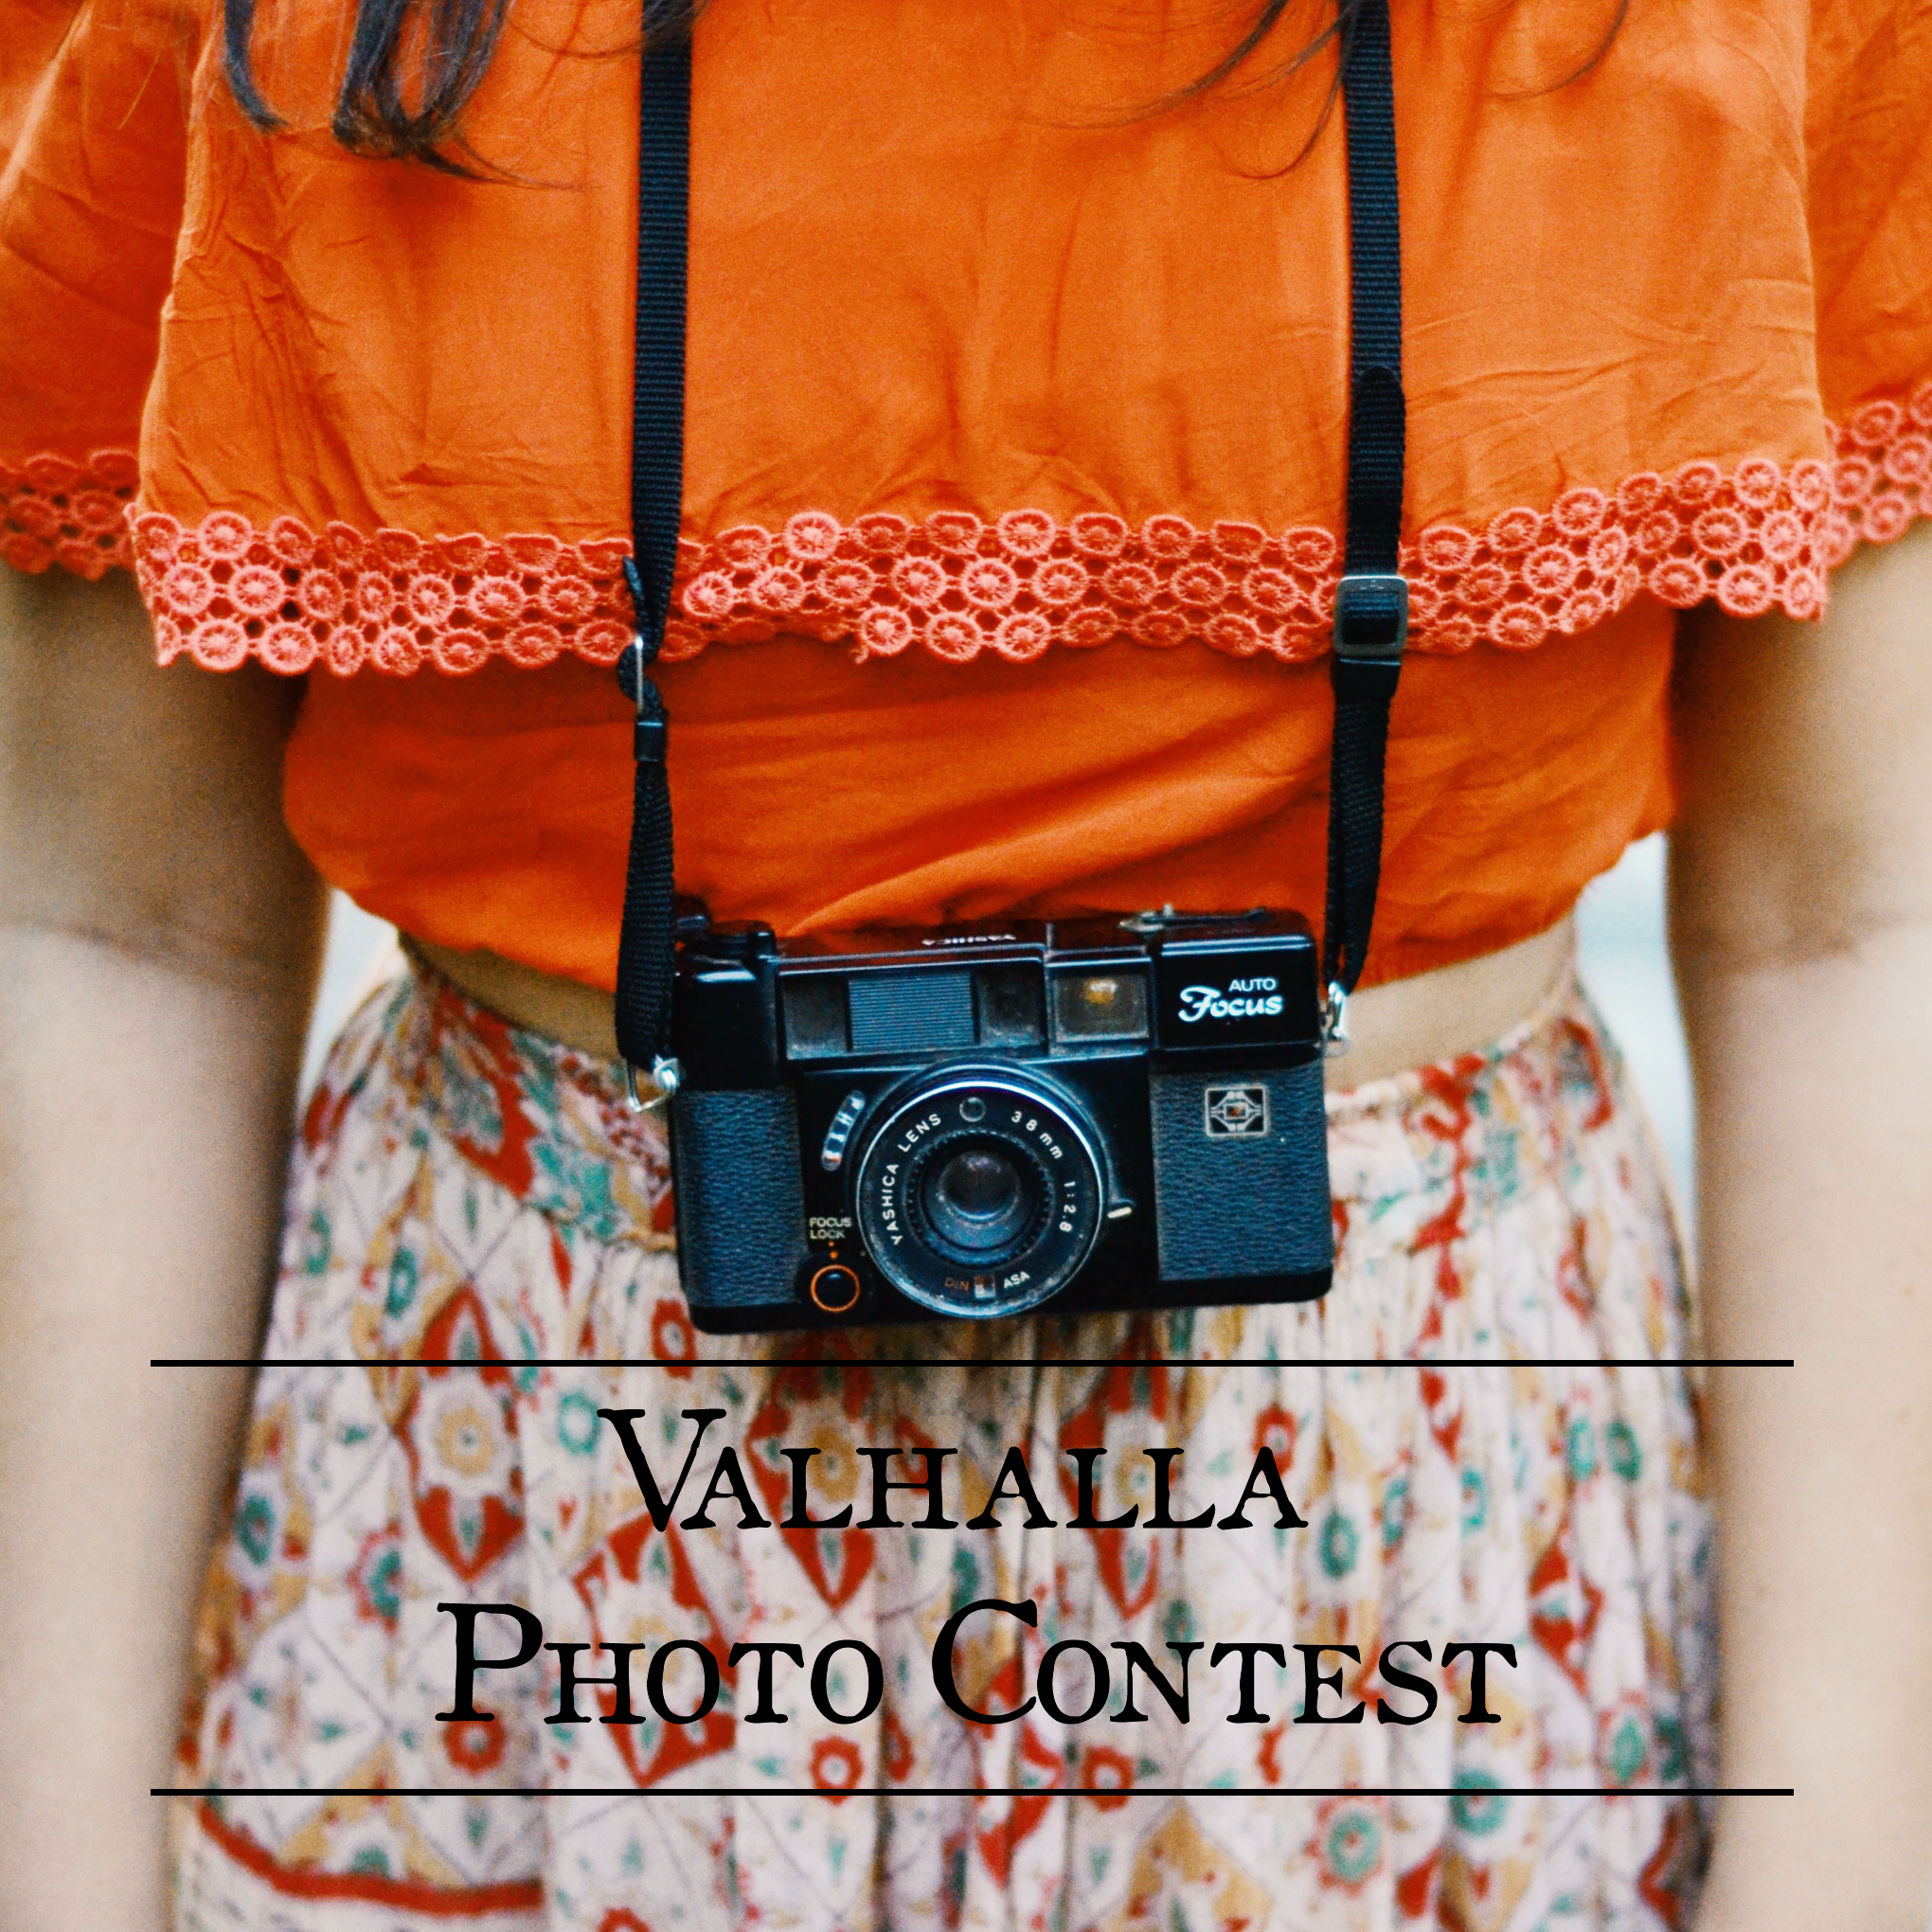 Photo Contest at Valhalla